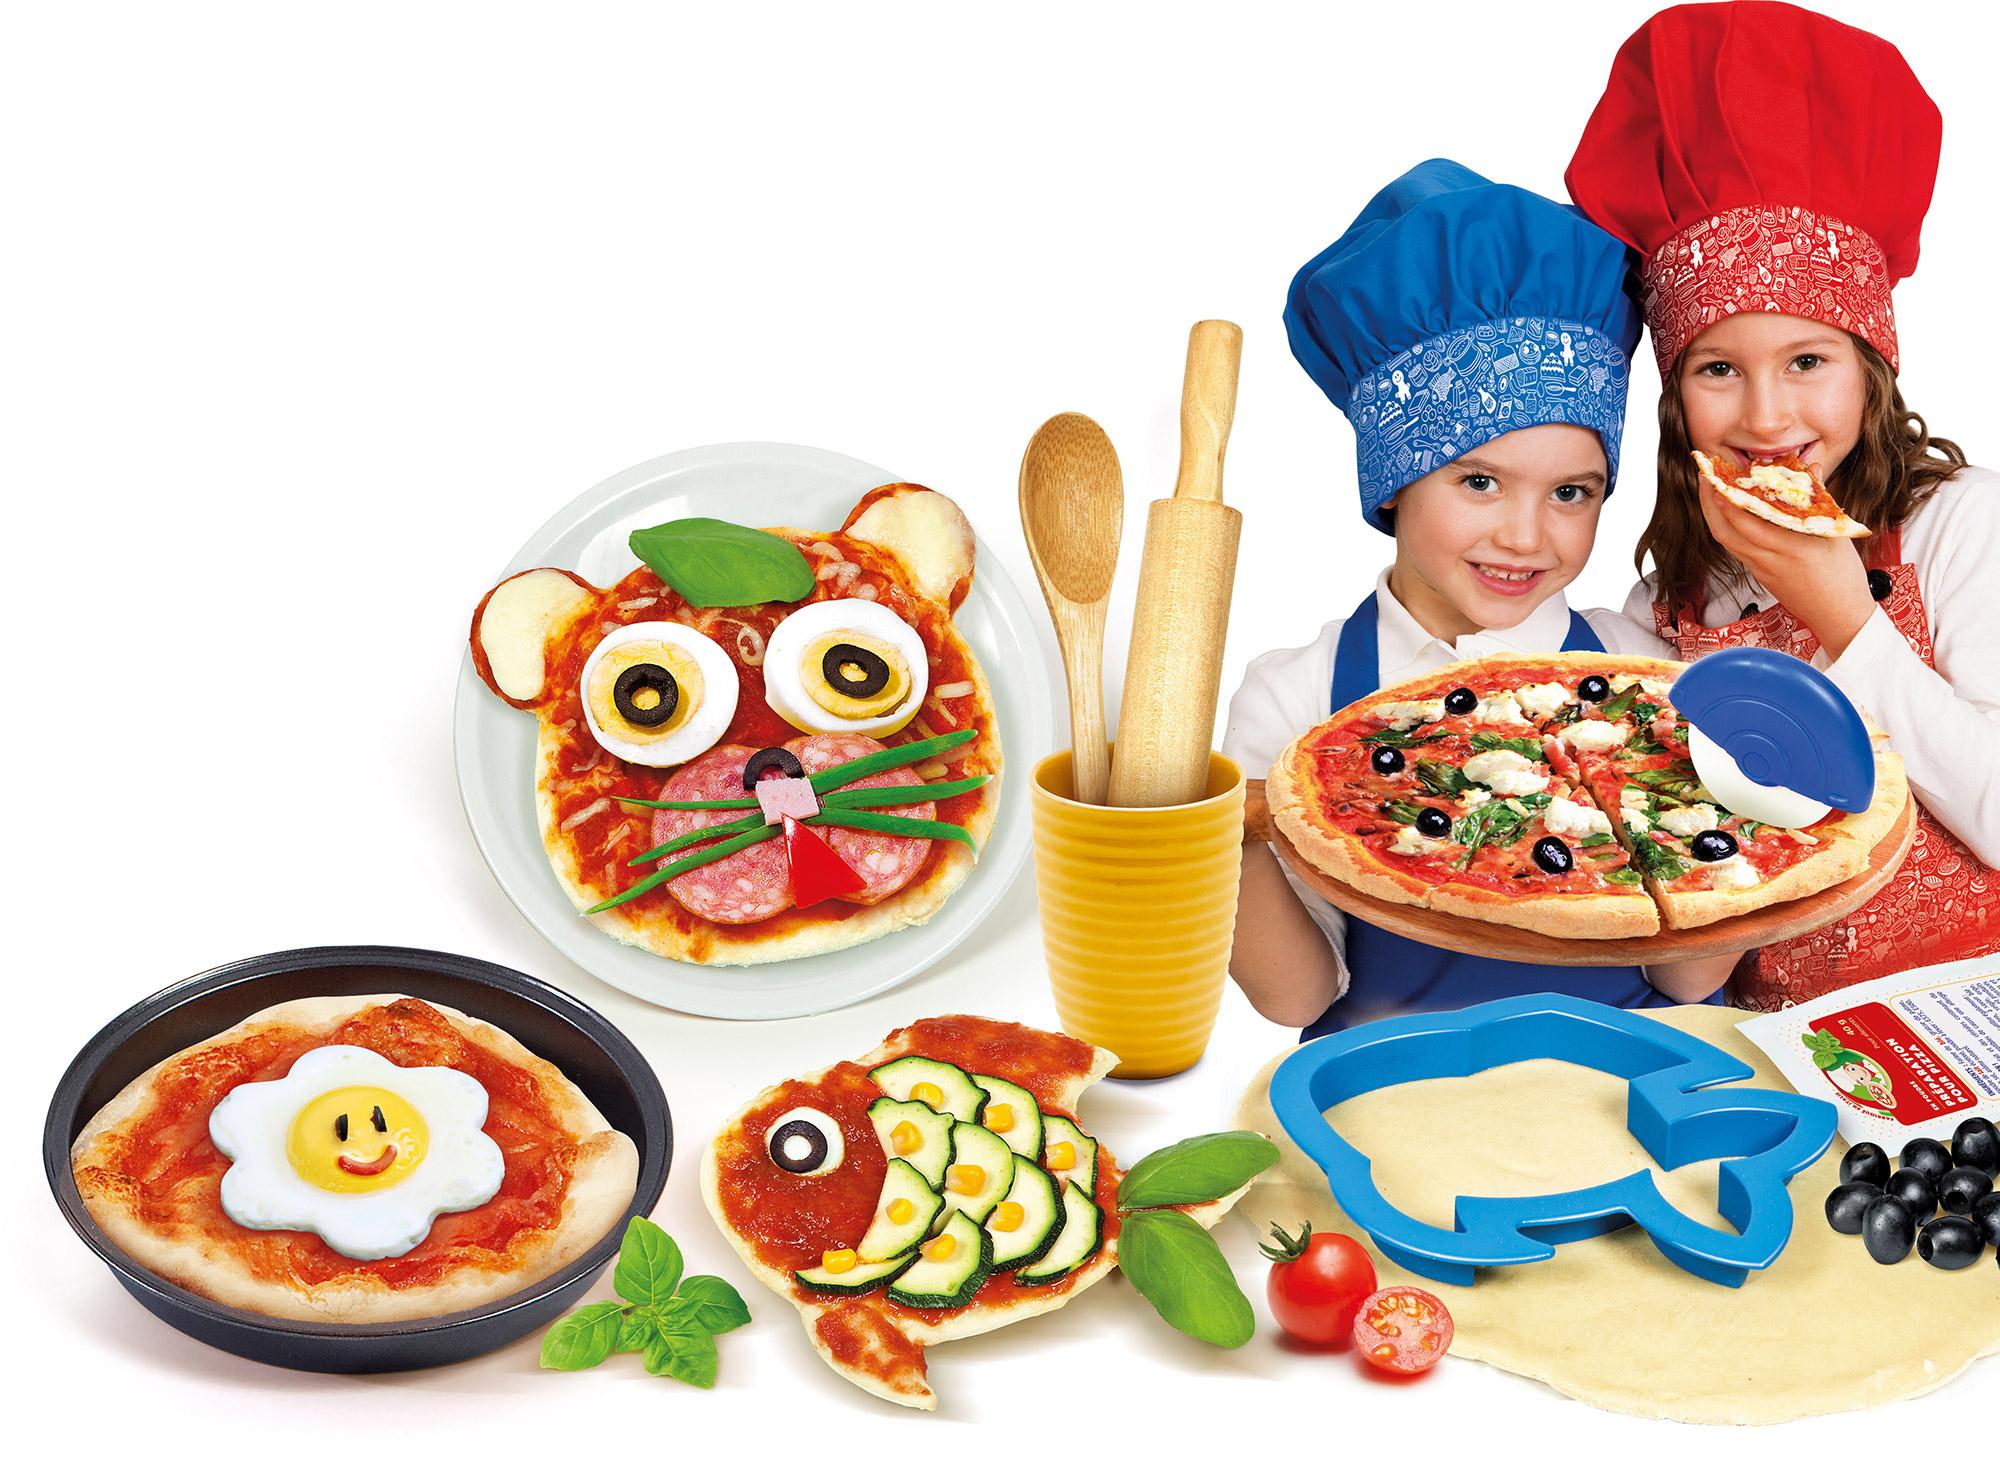 Clementoni 15781 Cucina Creativa Pizza Party